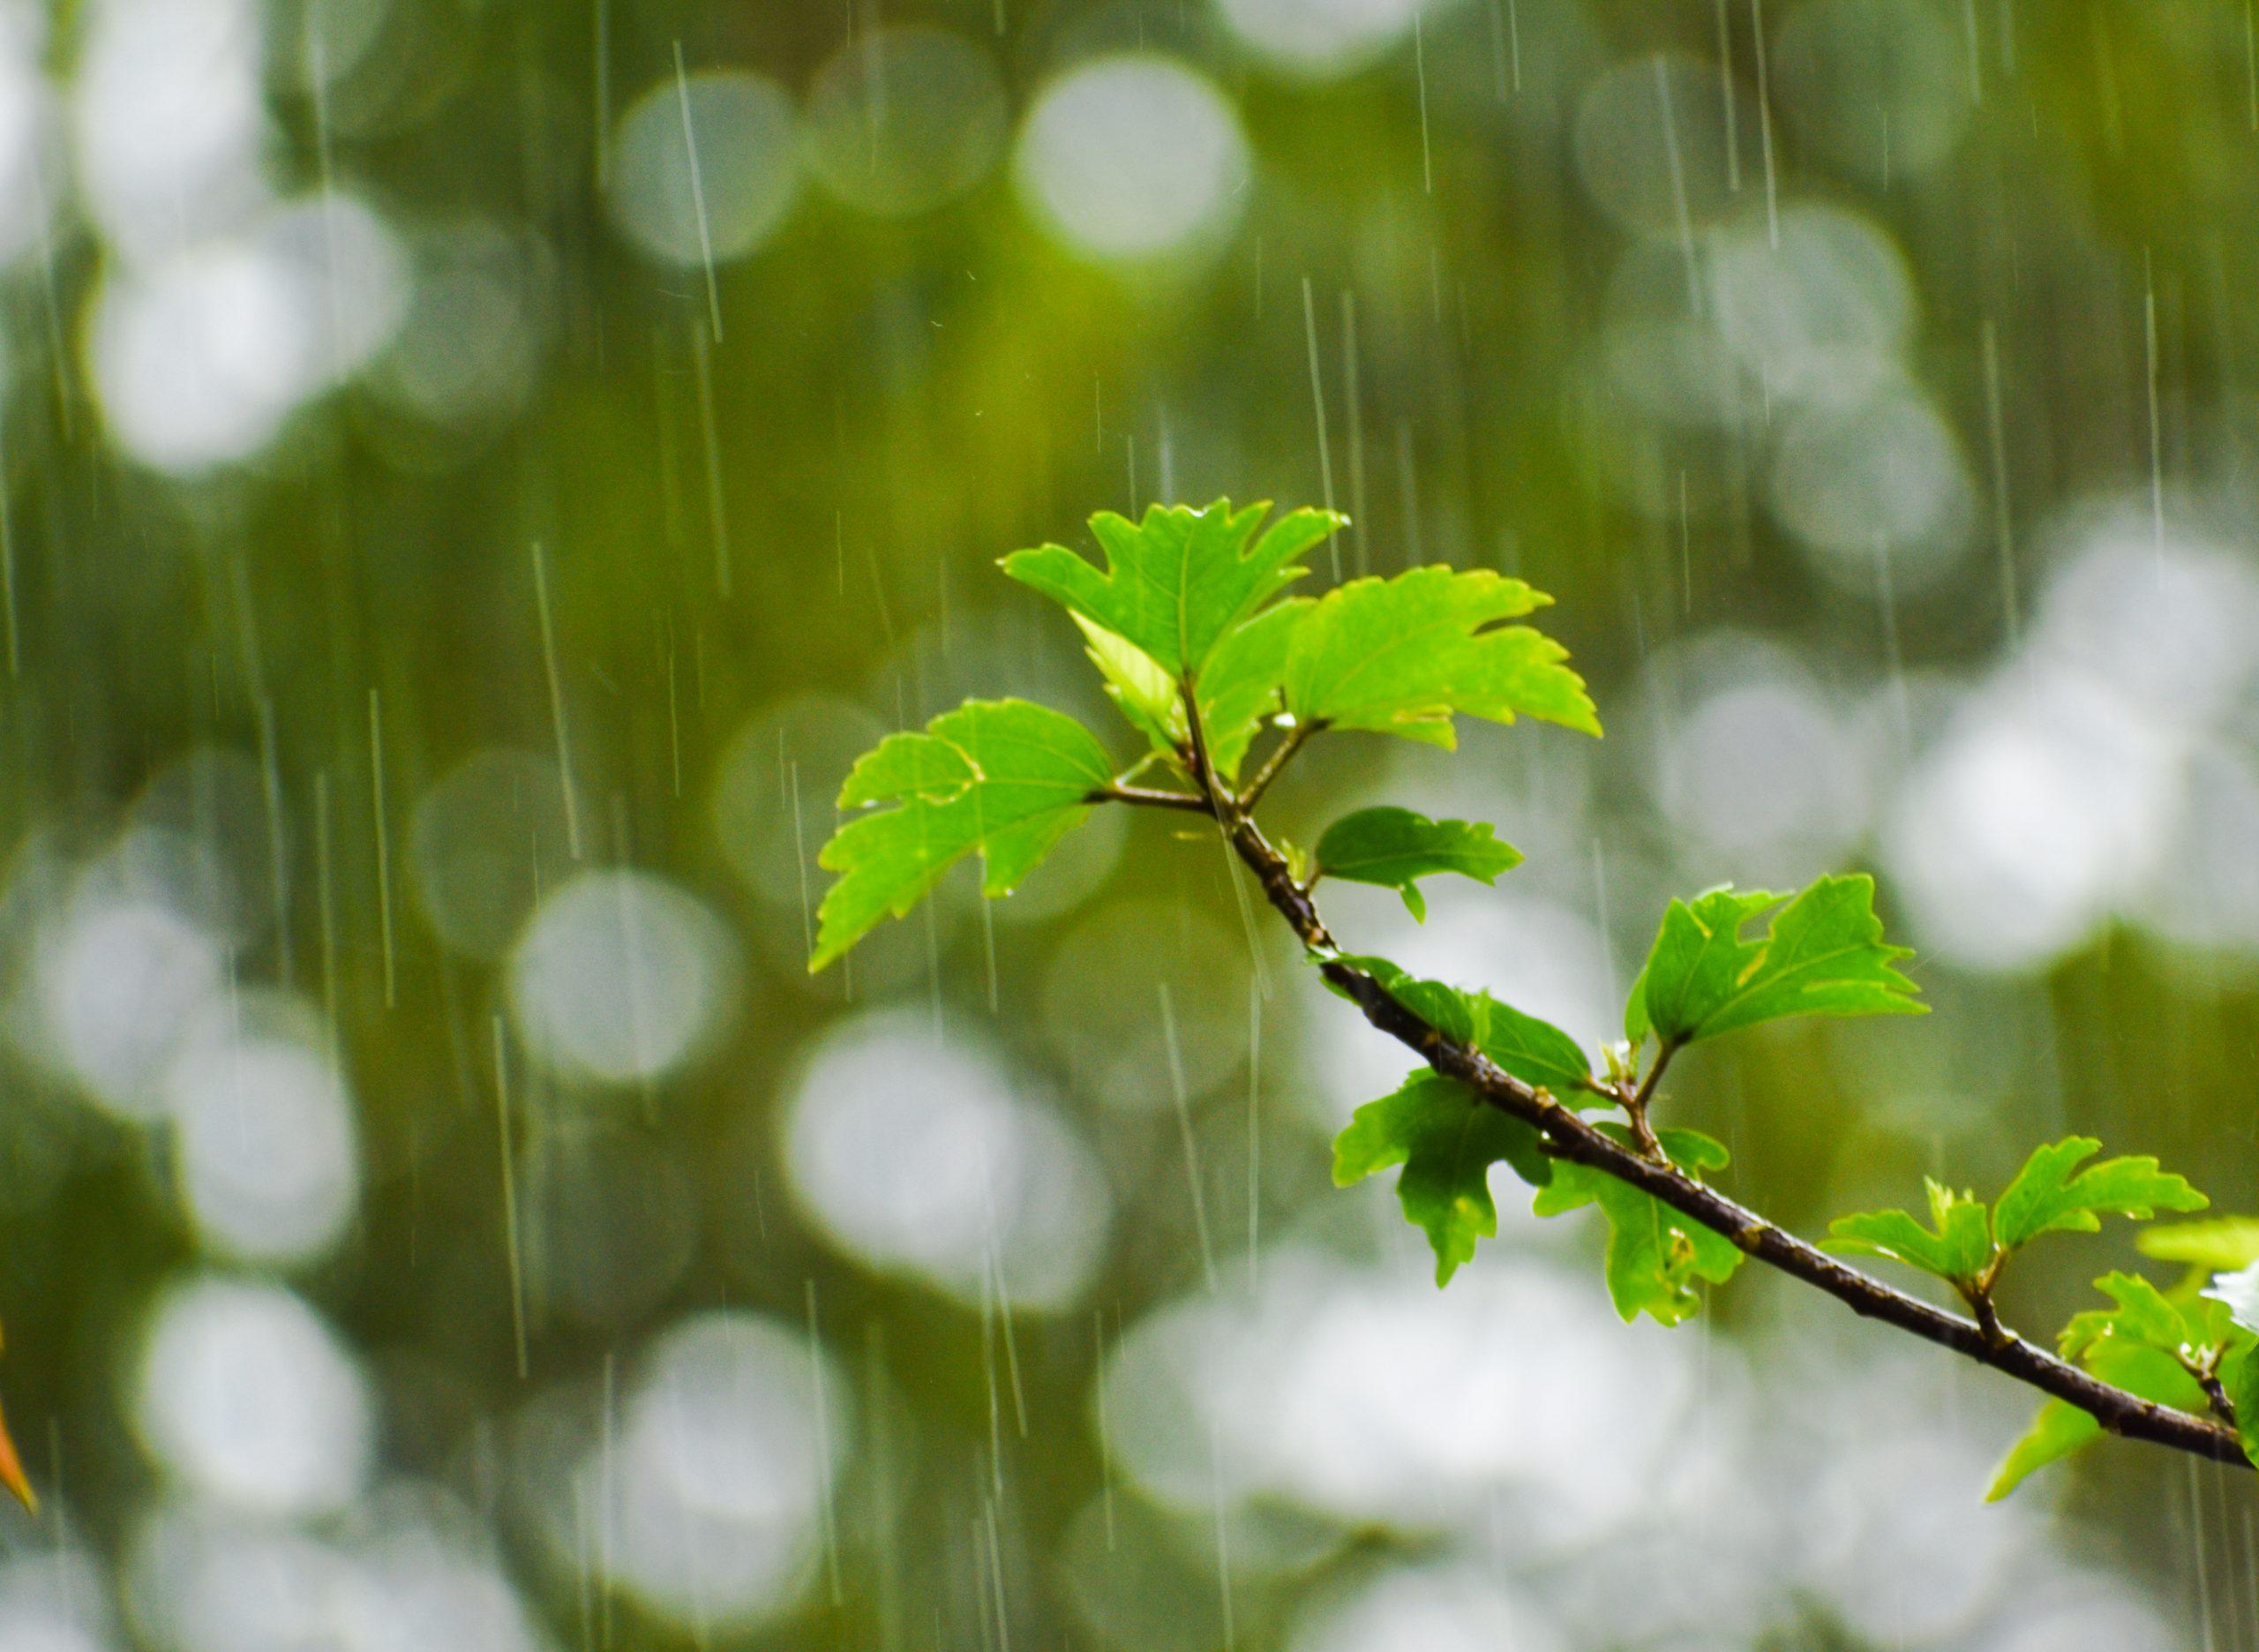 Bokeh shot of rain falling on a tree branch